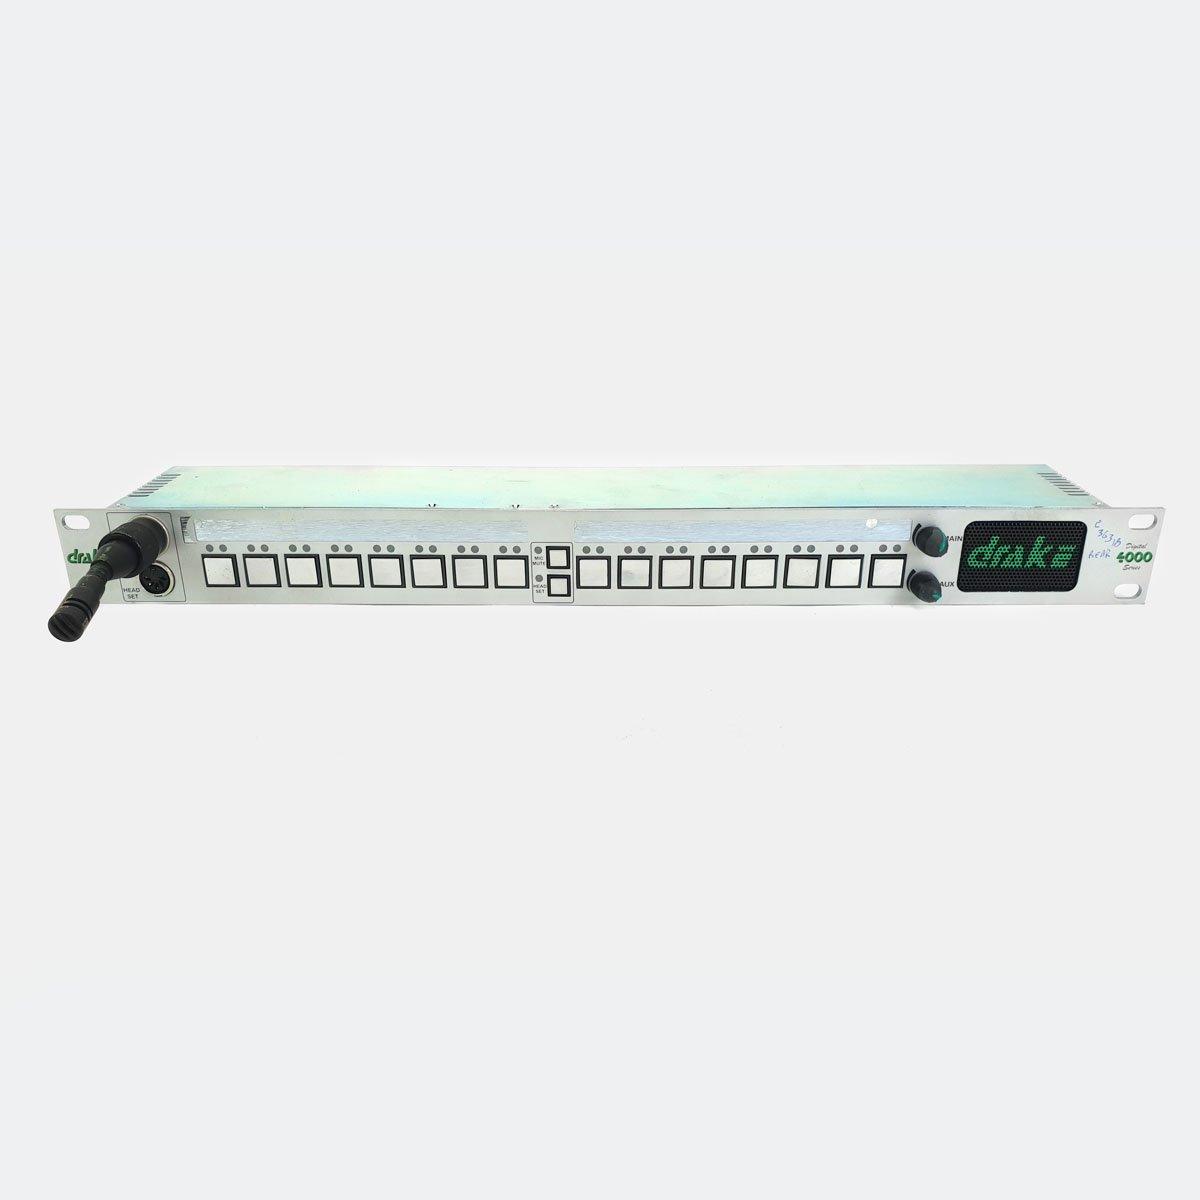 Used Drake PD4215 talkback panel for 4000 Series